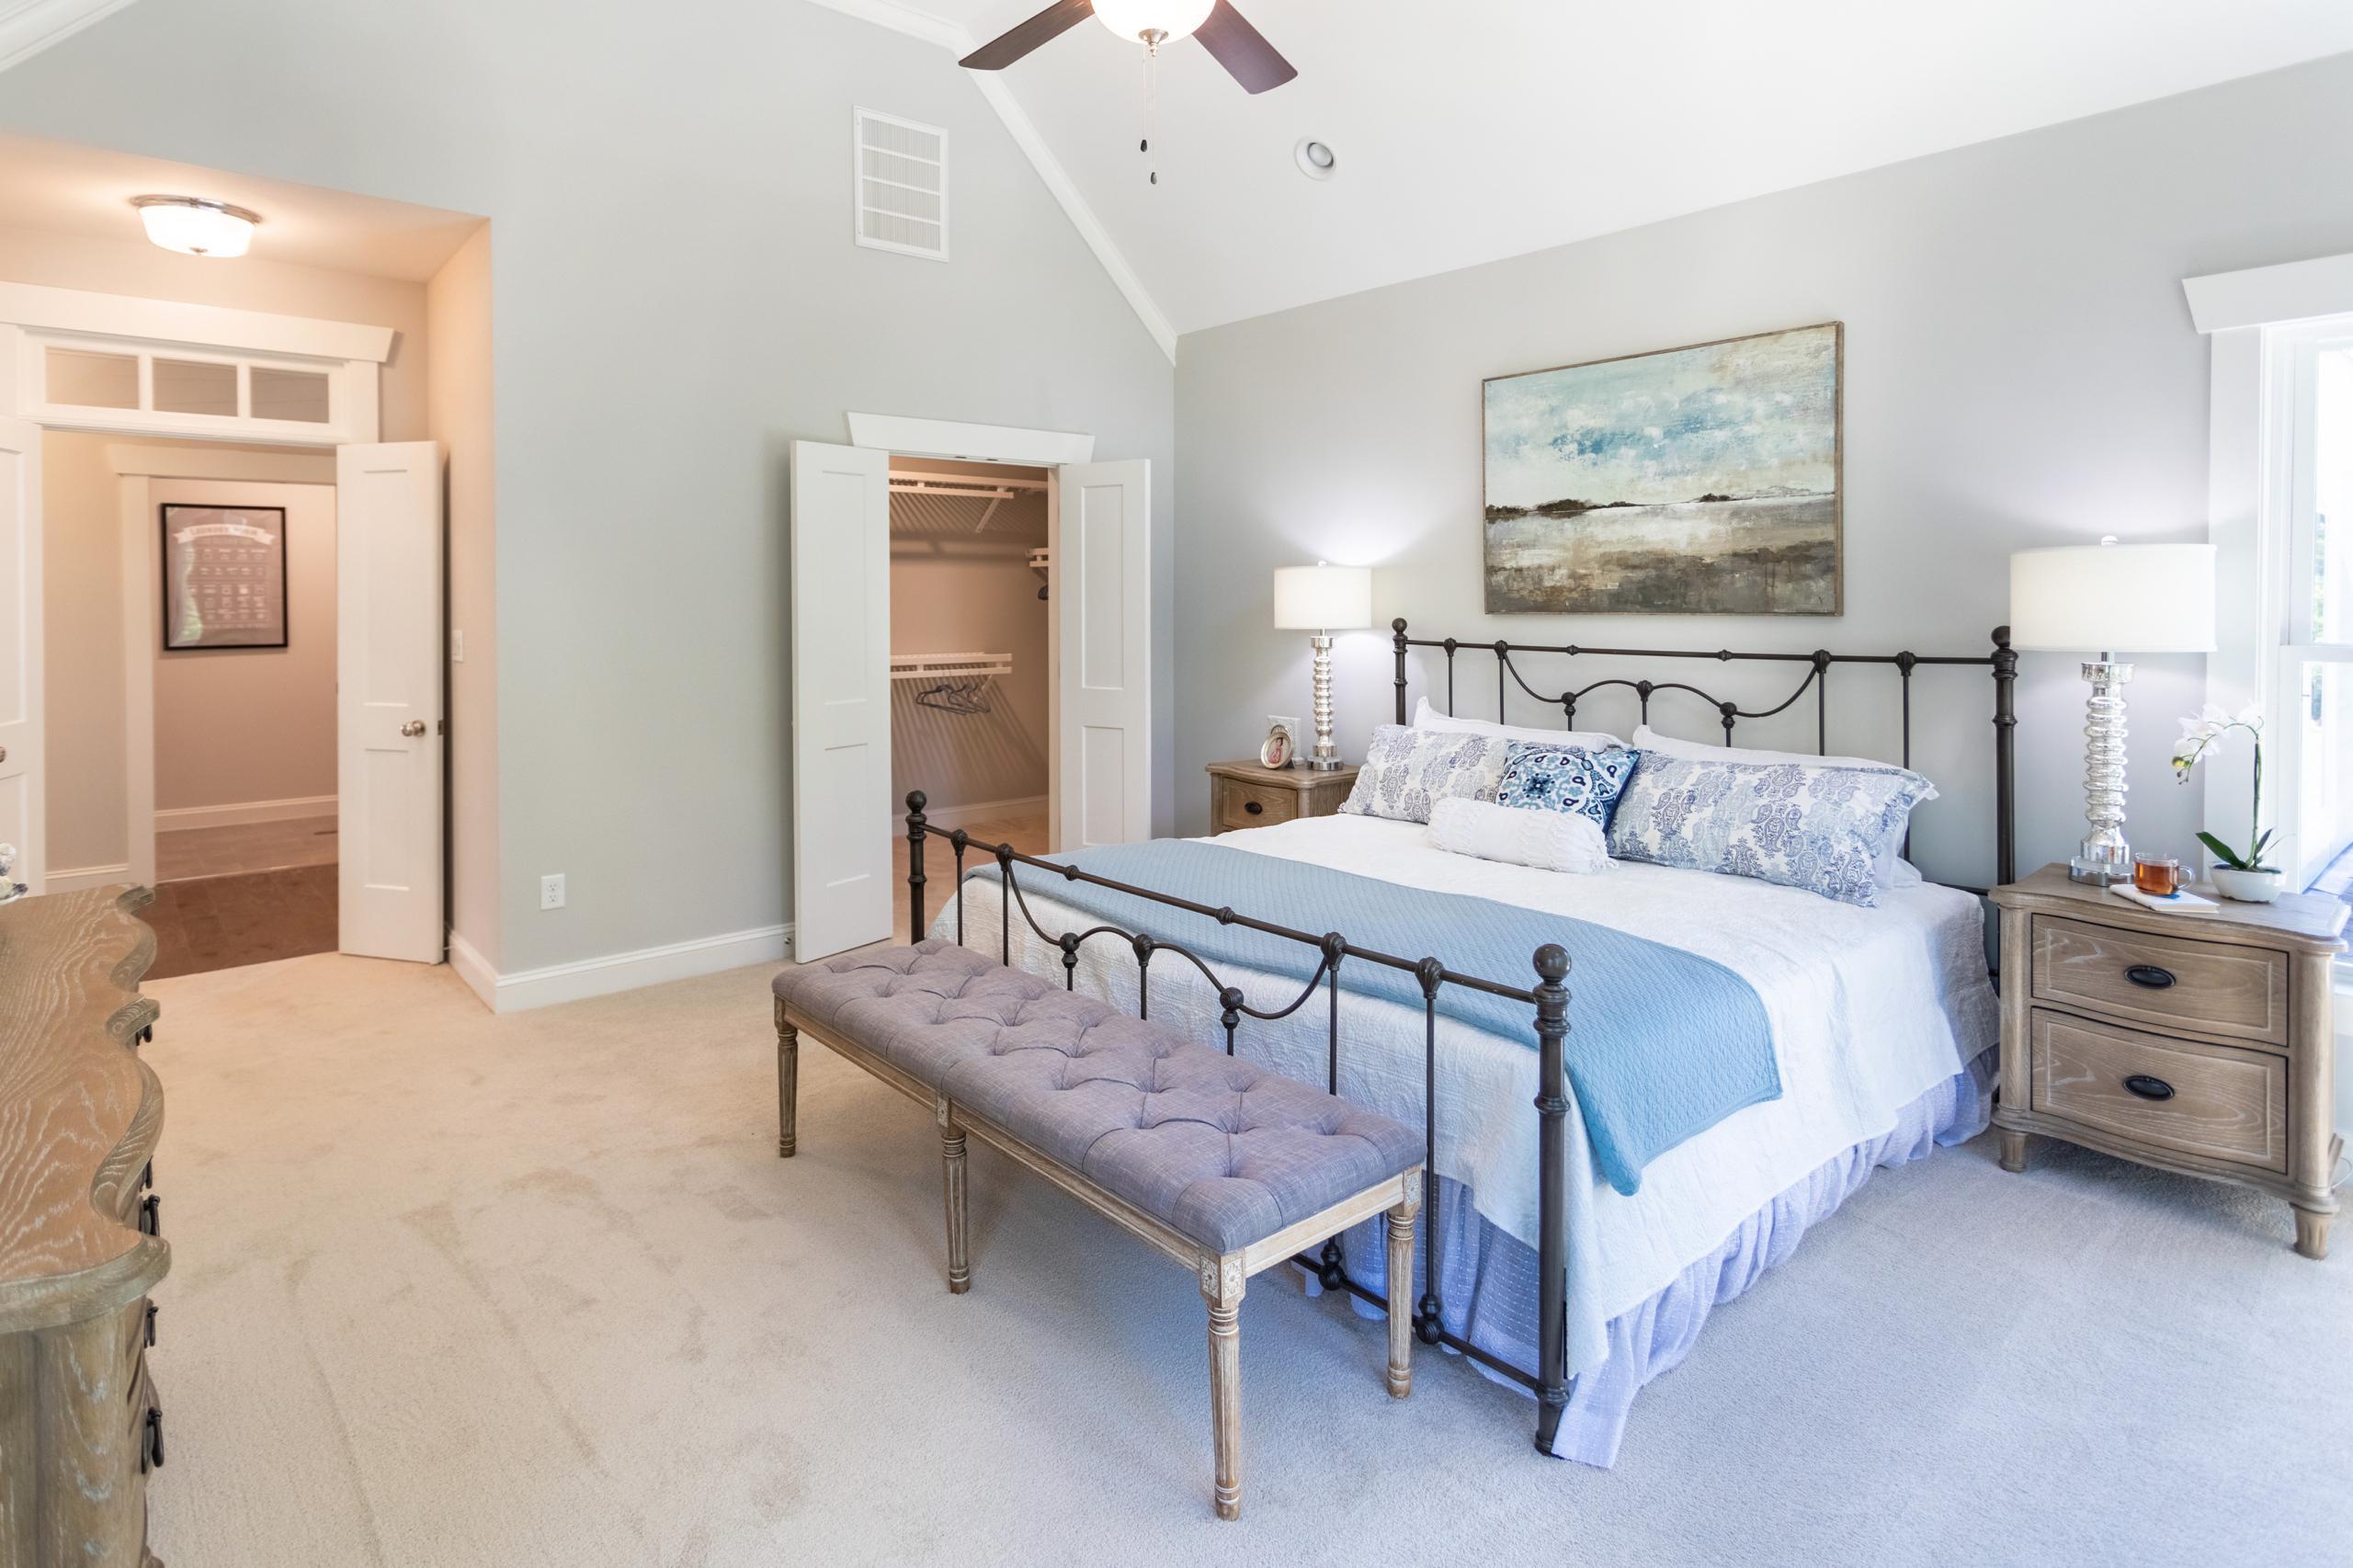 Bedroom featured in The Waverly By Stephen Alexander Homes in Norfolk-Newport News, VA